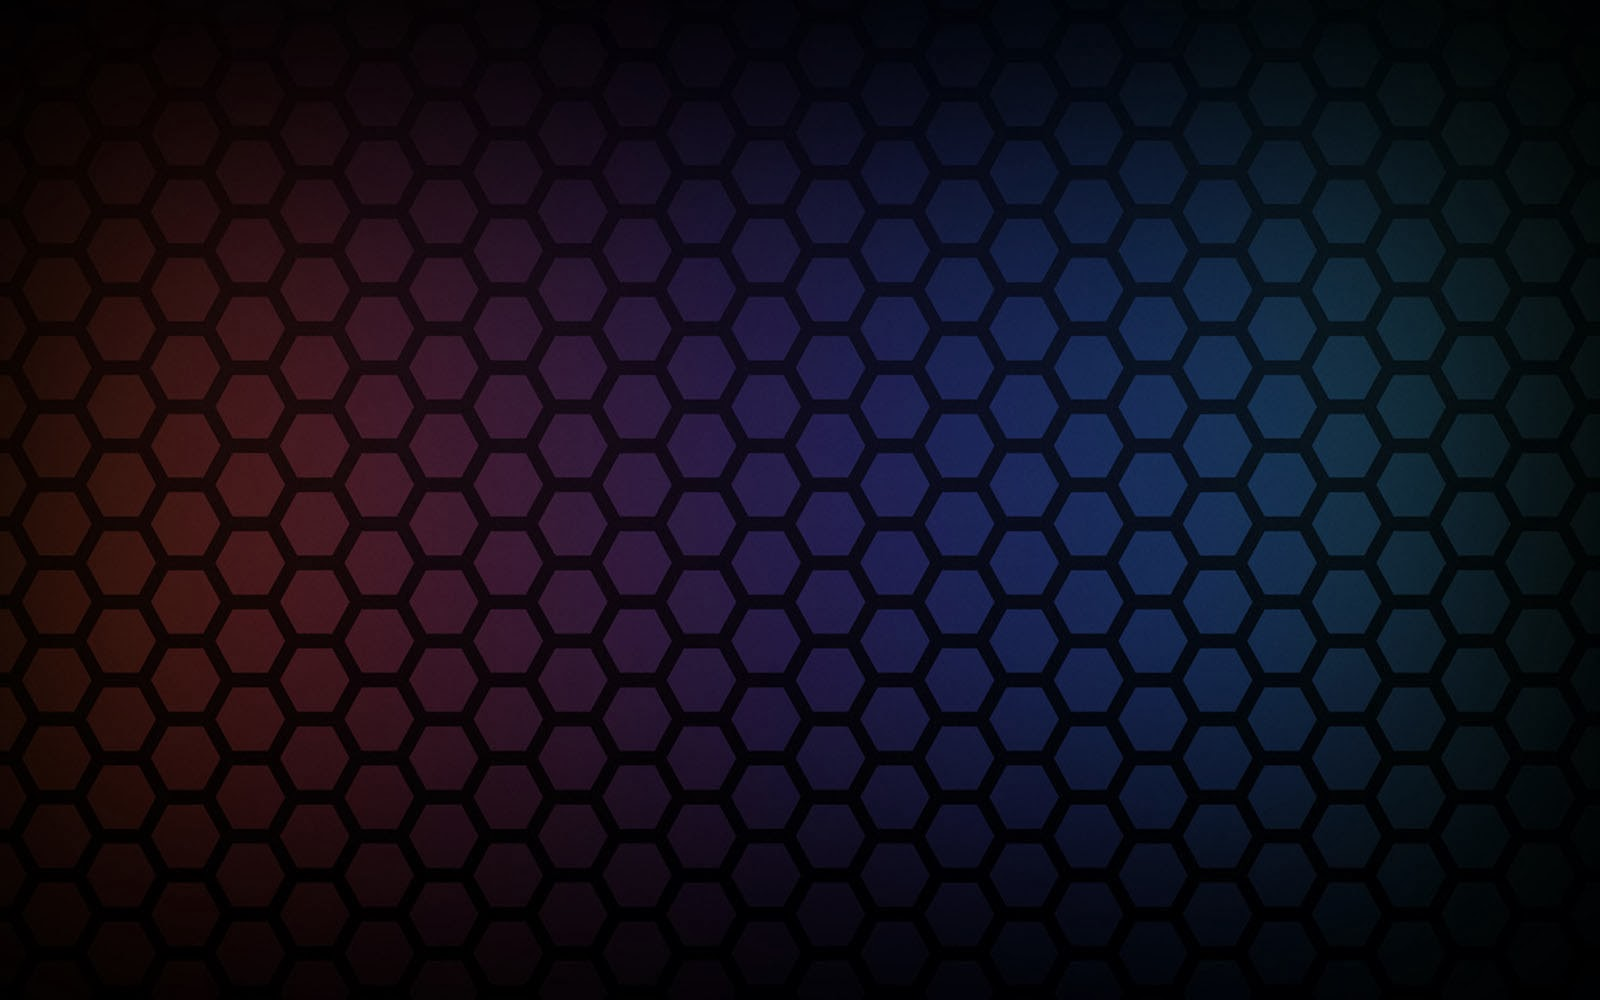 Acer Laptop Hd Wallpaper Download Wallpapers 3d Honeycomb Wallpapers